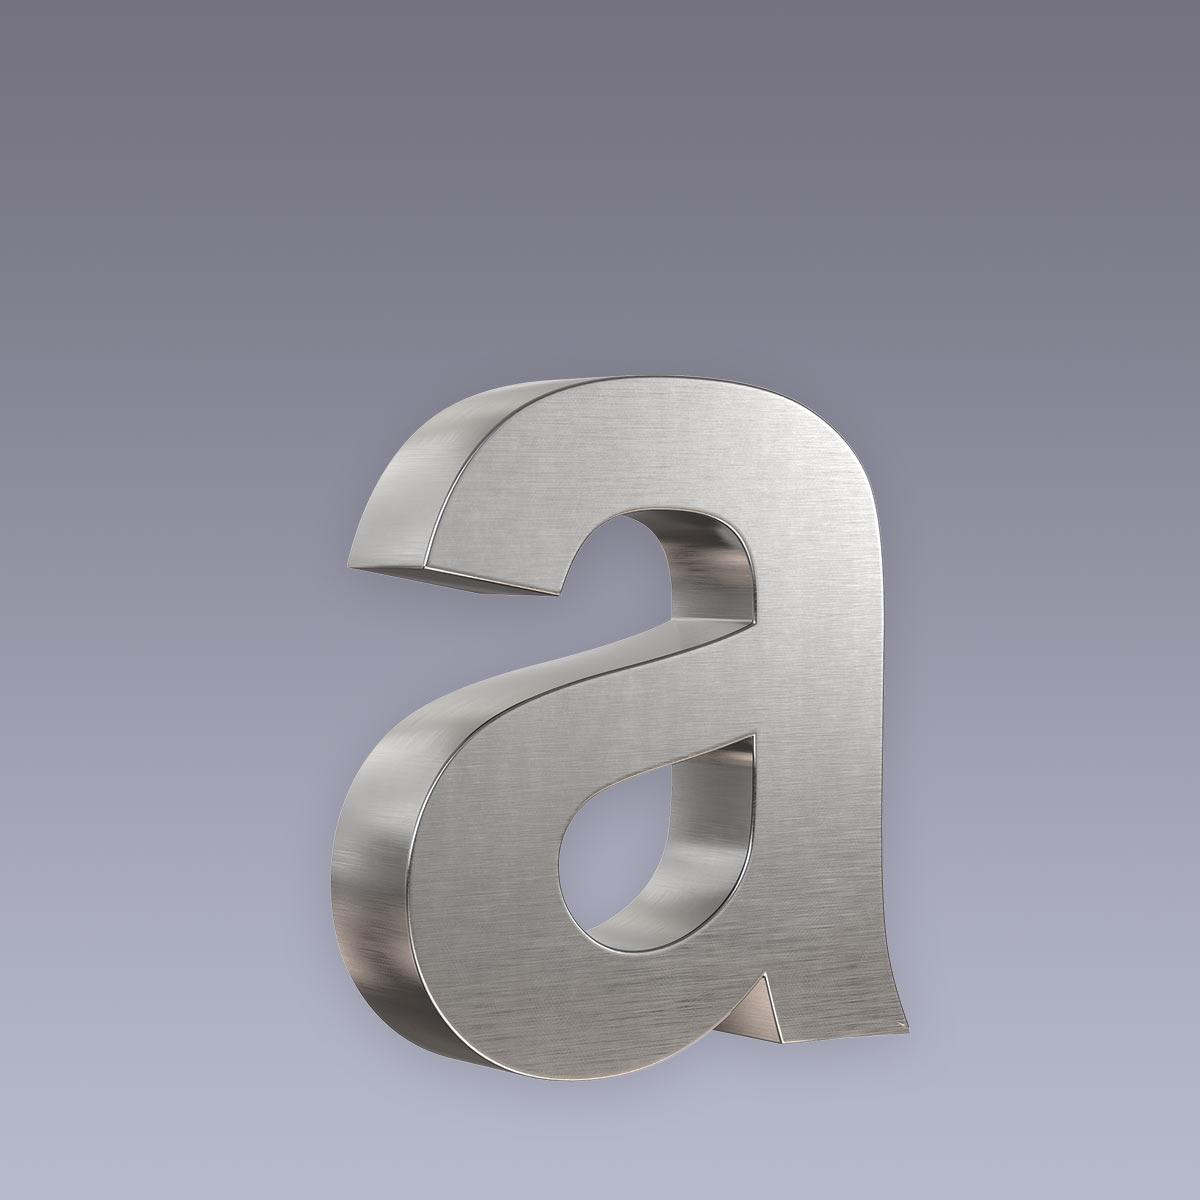 3D Hausnummer a Edelstahl in 3D Design Arial V2A